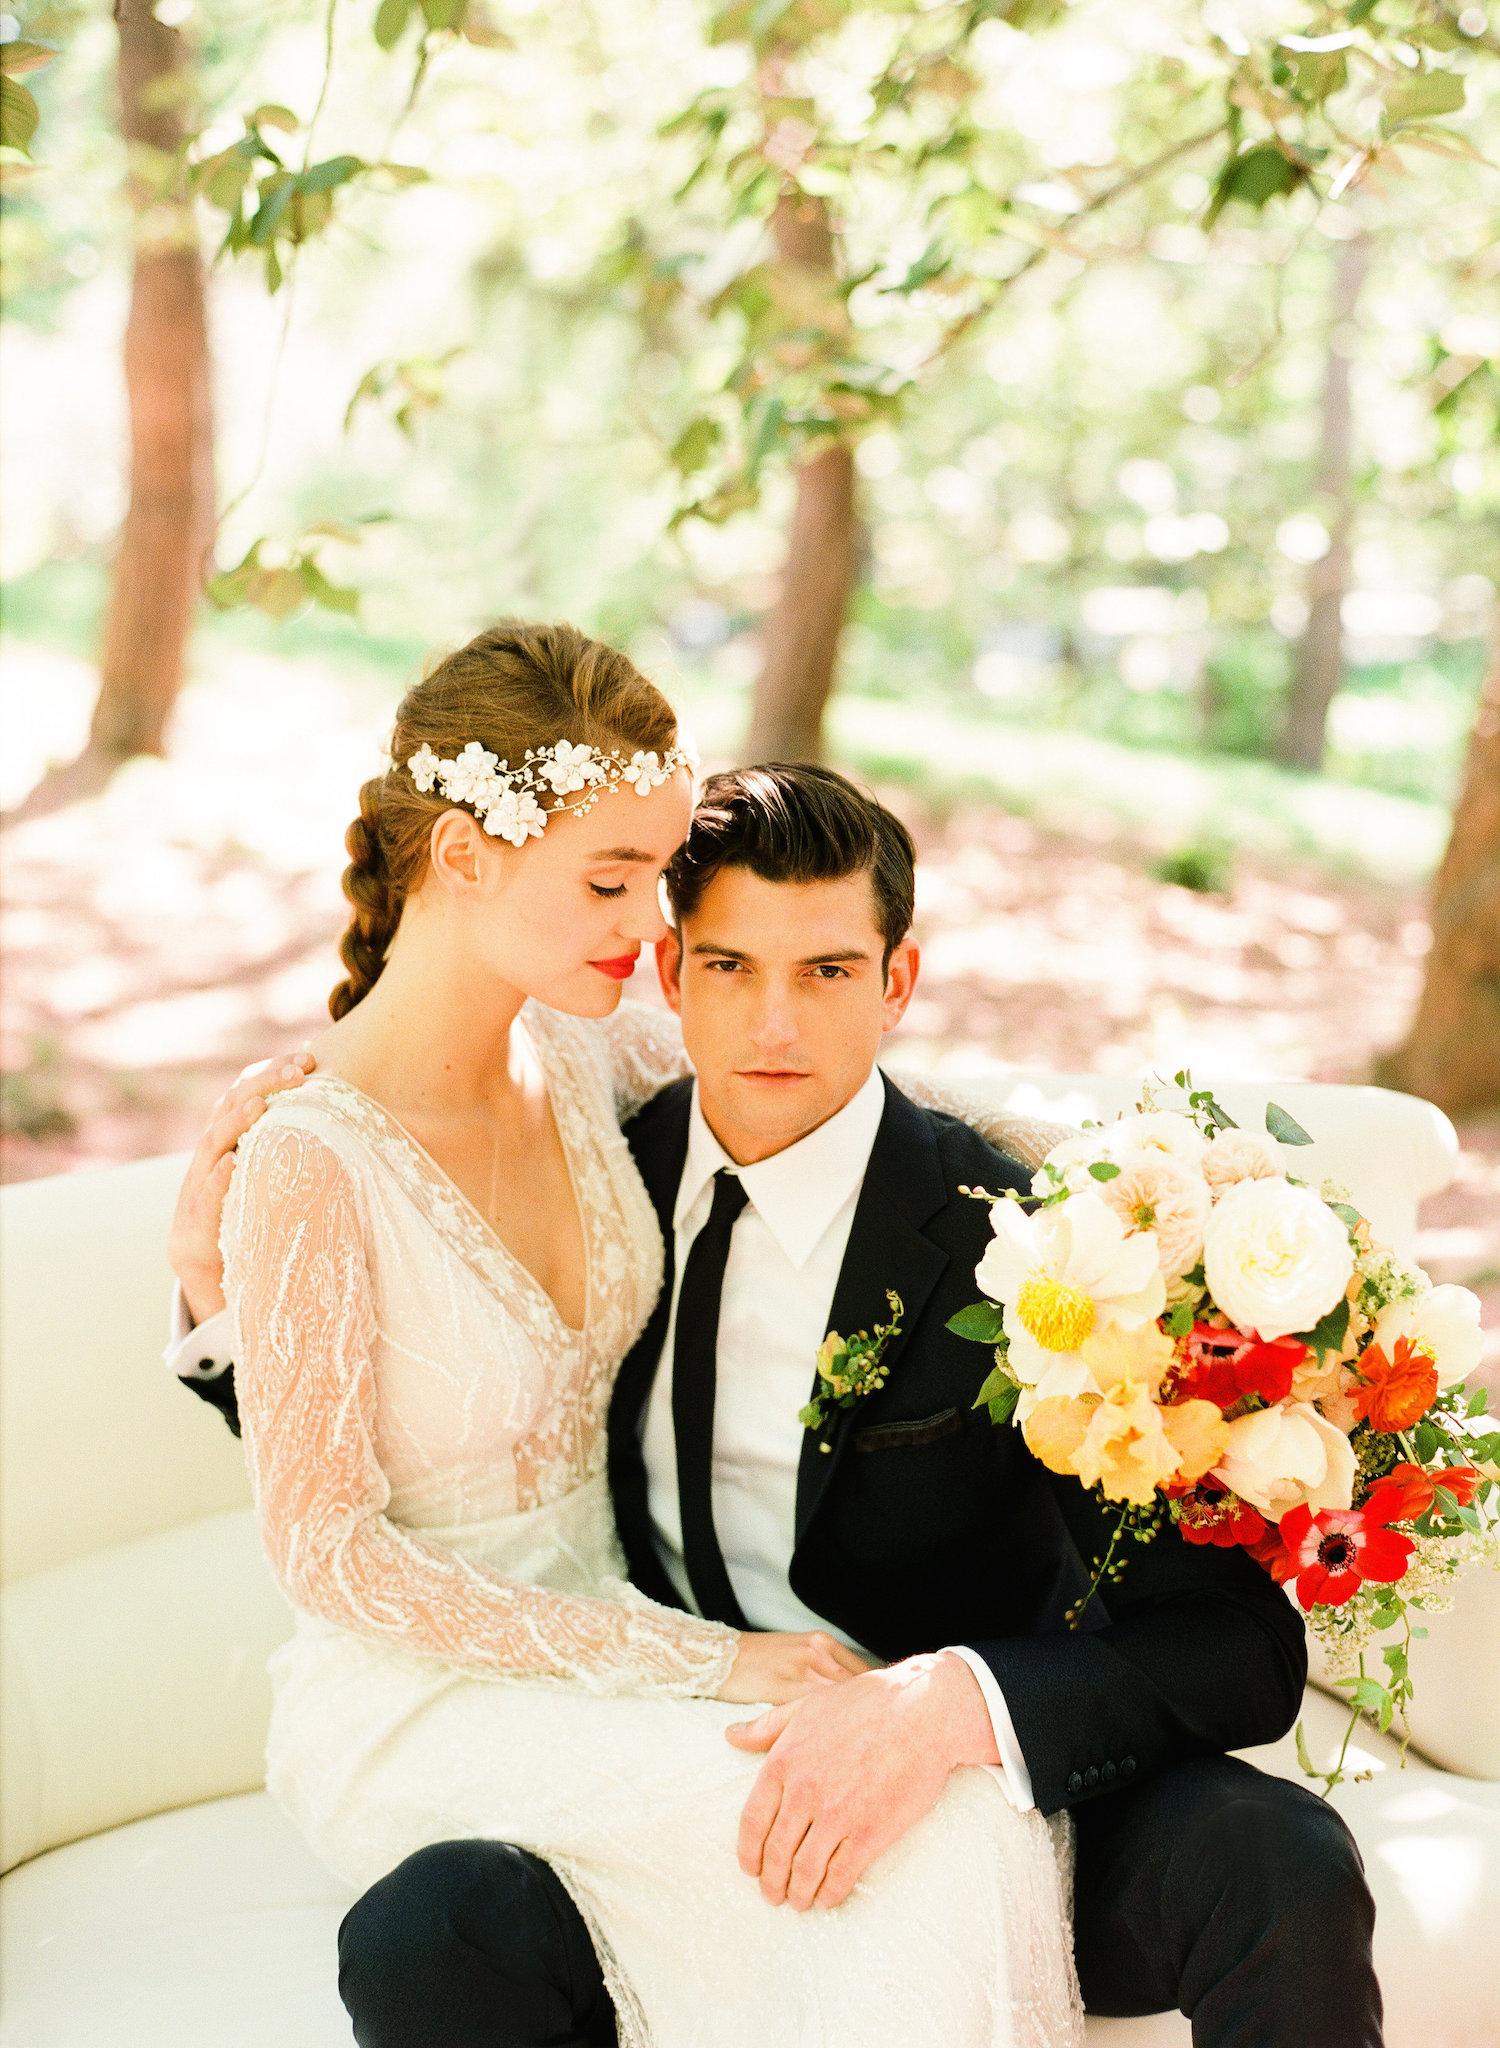 Morning Glow - Full Aperture Floral & Lindsay Madden Photography 36.jpeg